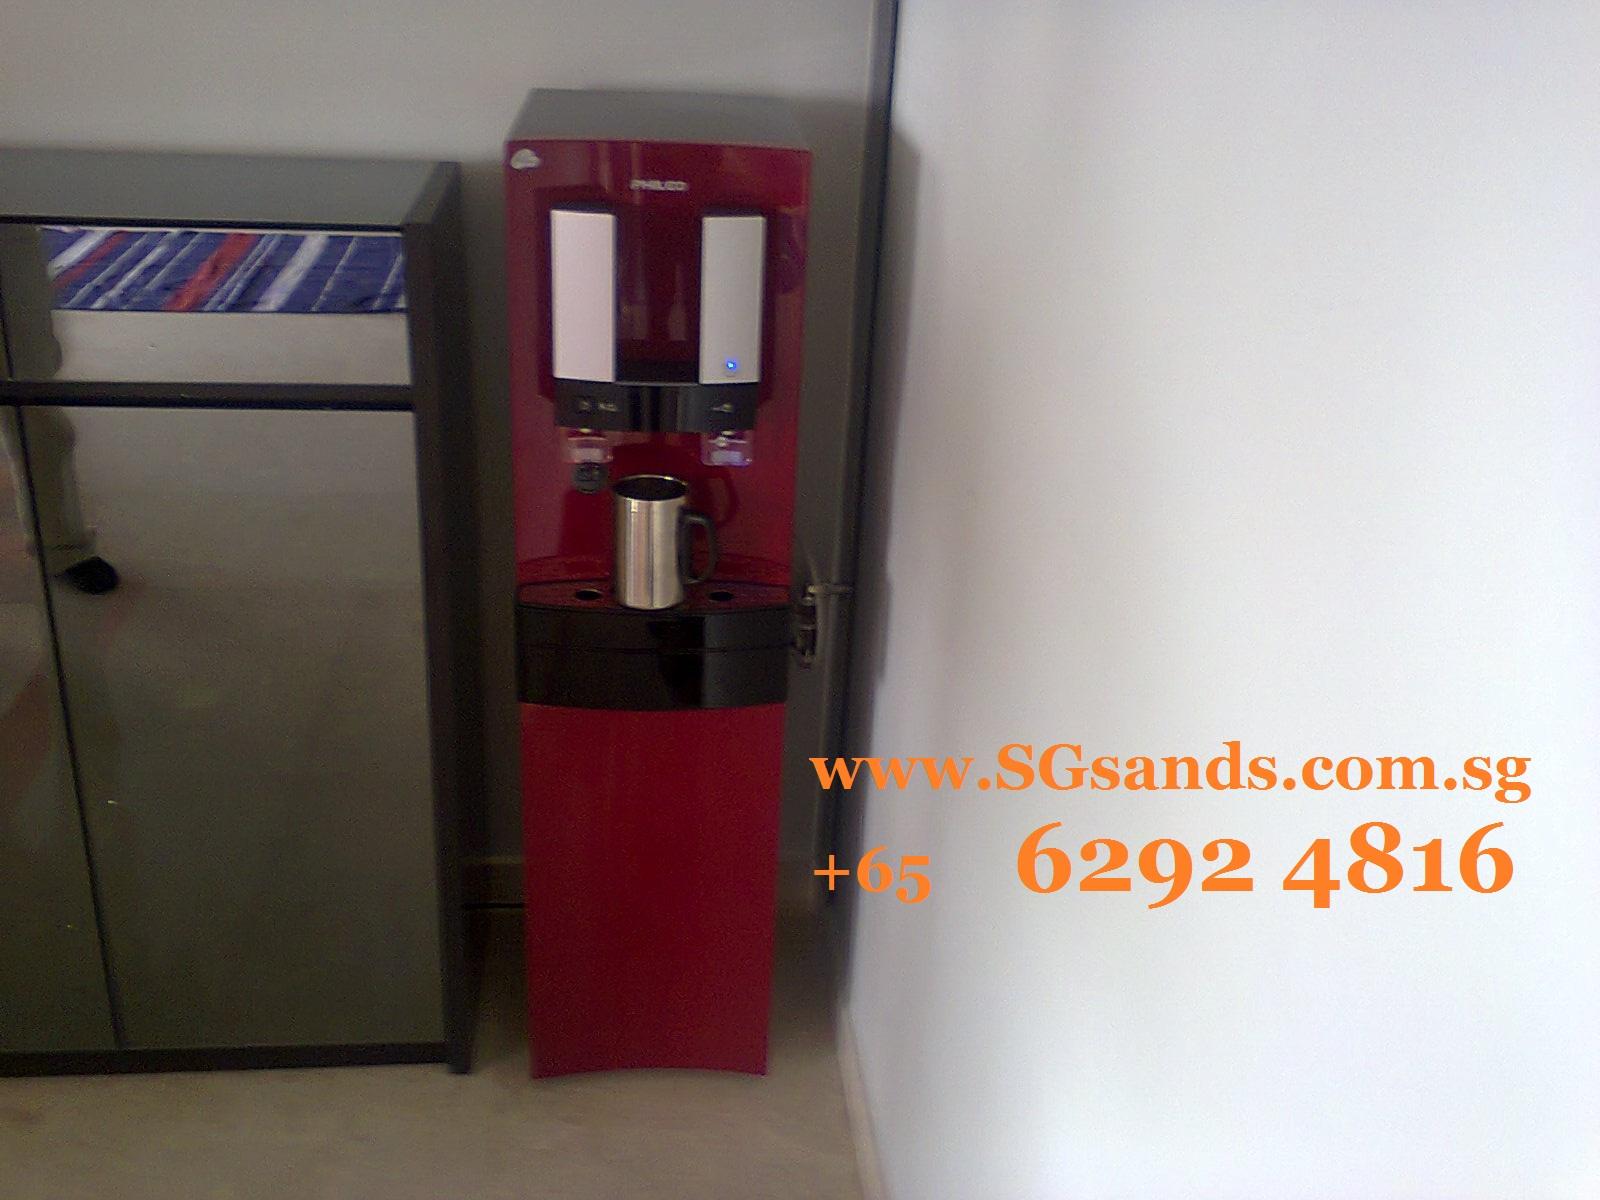 Singapore Water Dispenser Photo Gallery Sgsands Phileo